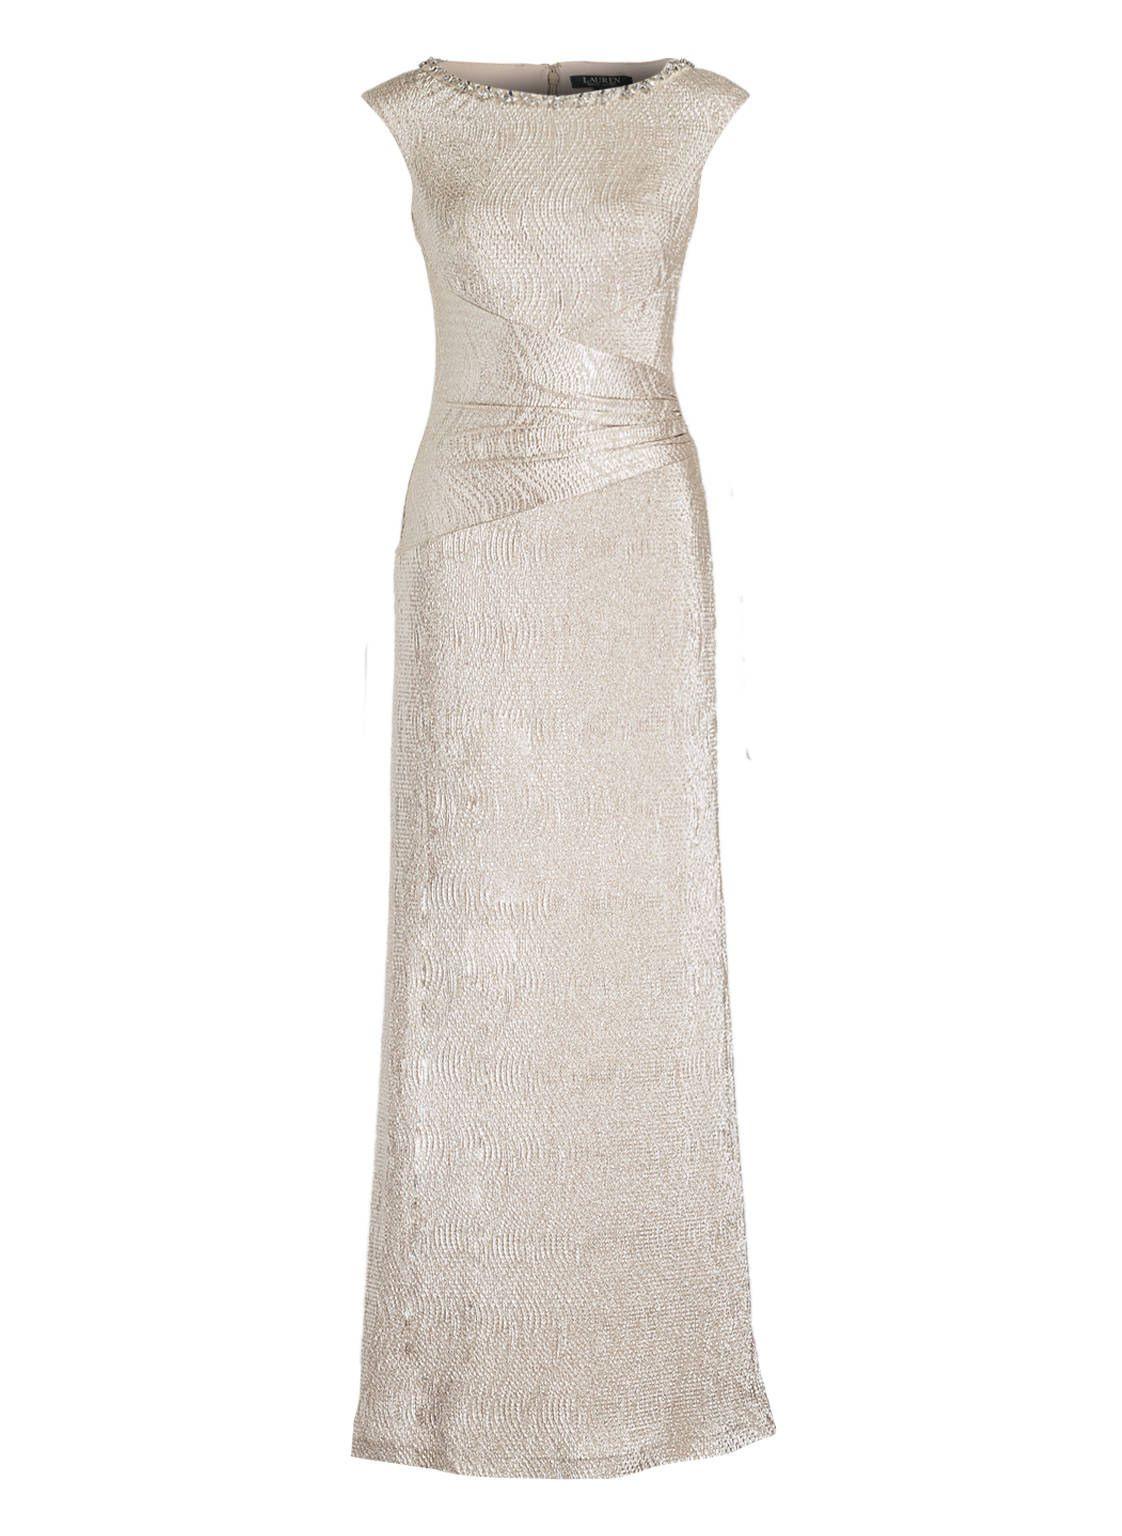 Designer Großartig Ralph Lauren Abendkleid Ärmel13 Elegant Ralph Lauren Abendkleid Ärmel